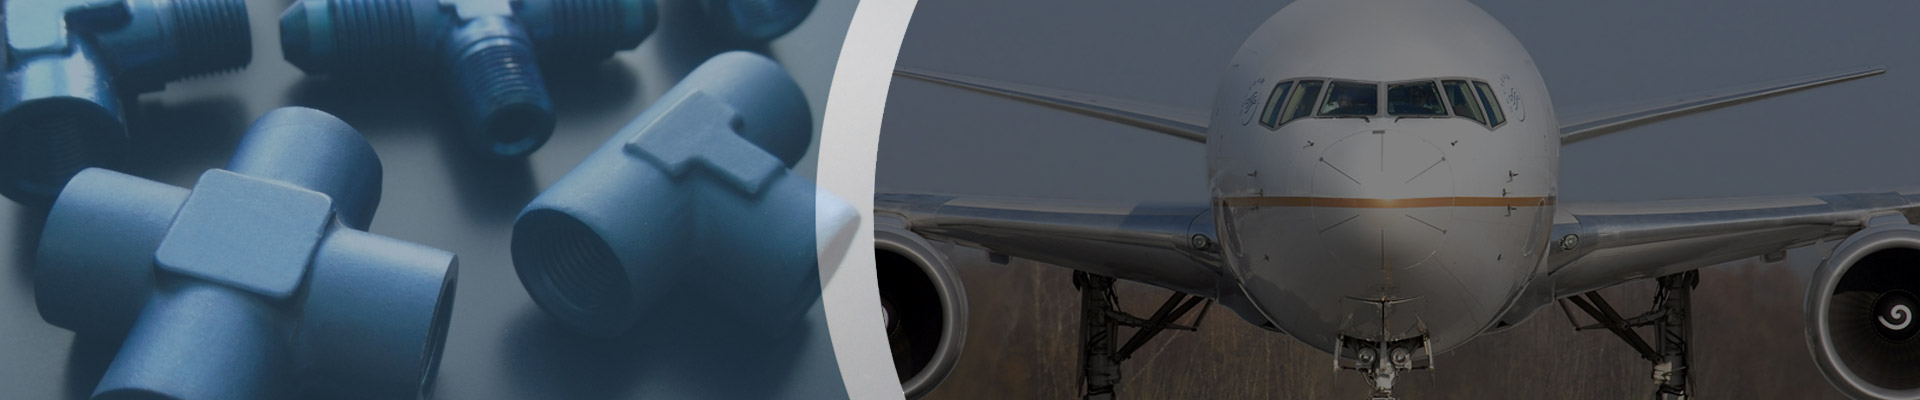 Aerospace Fittings